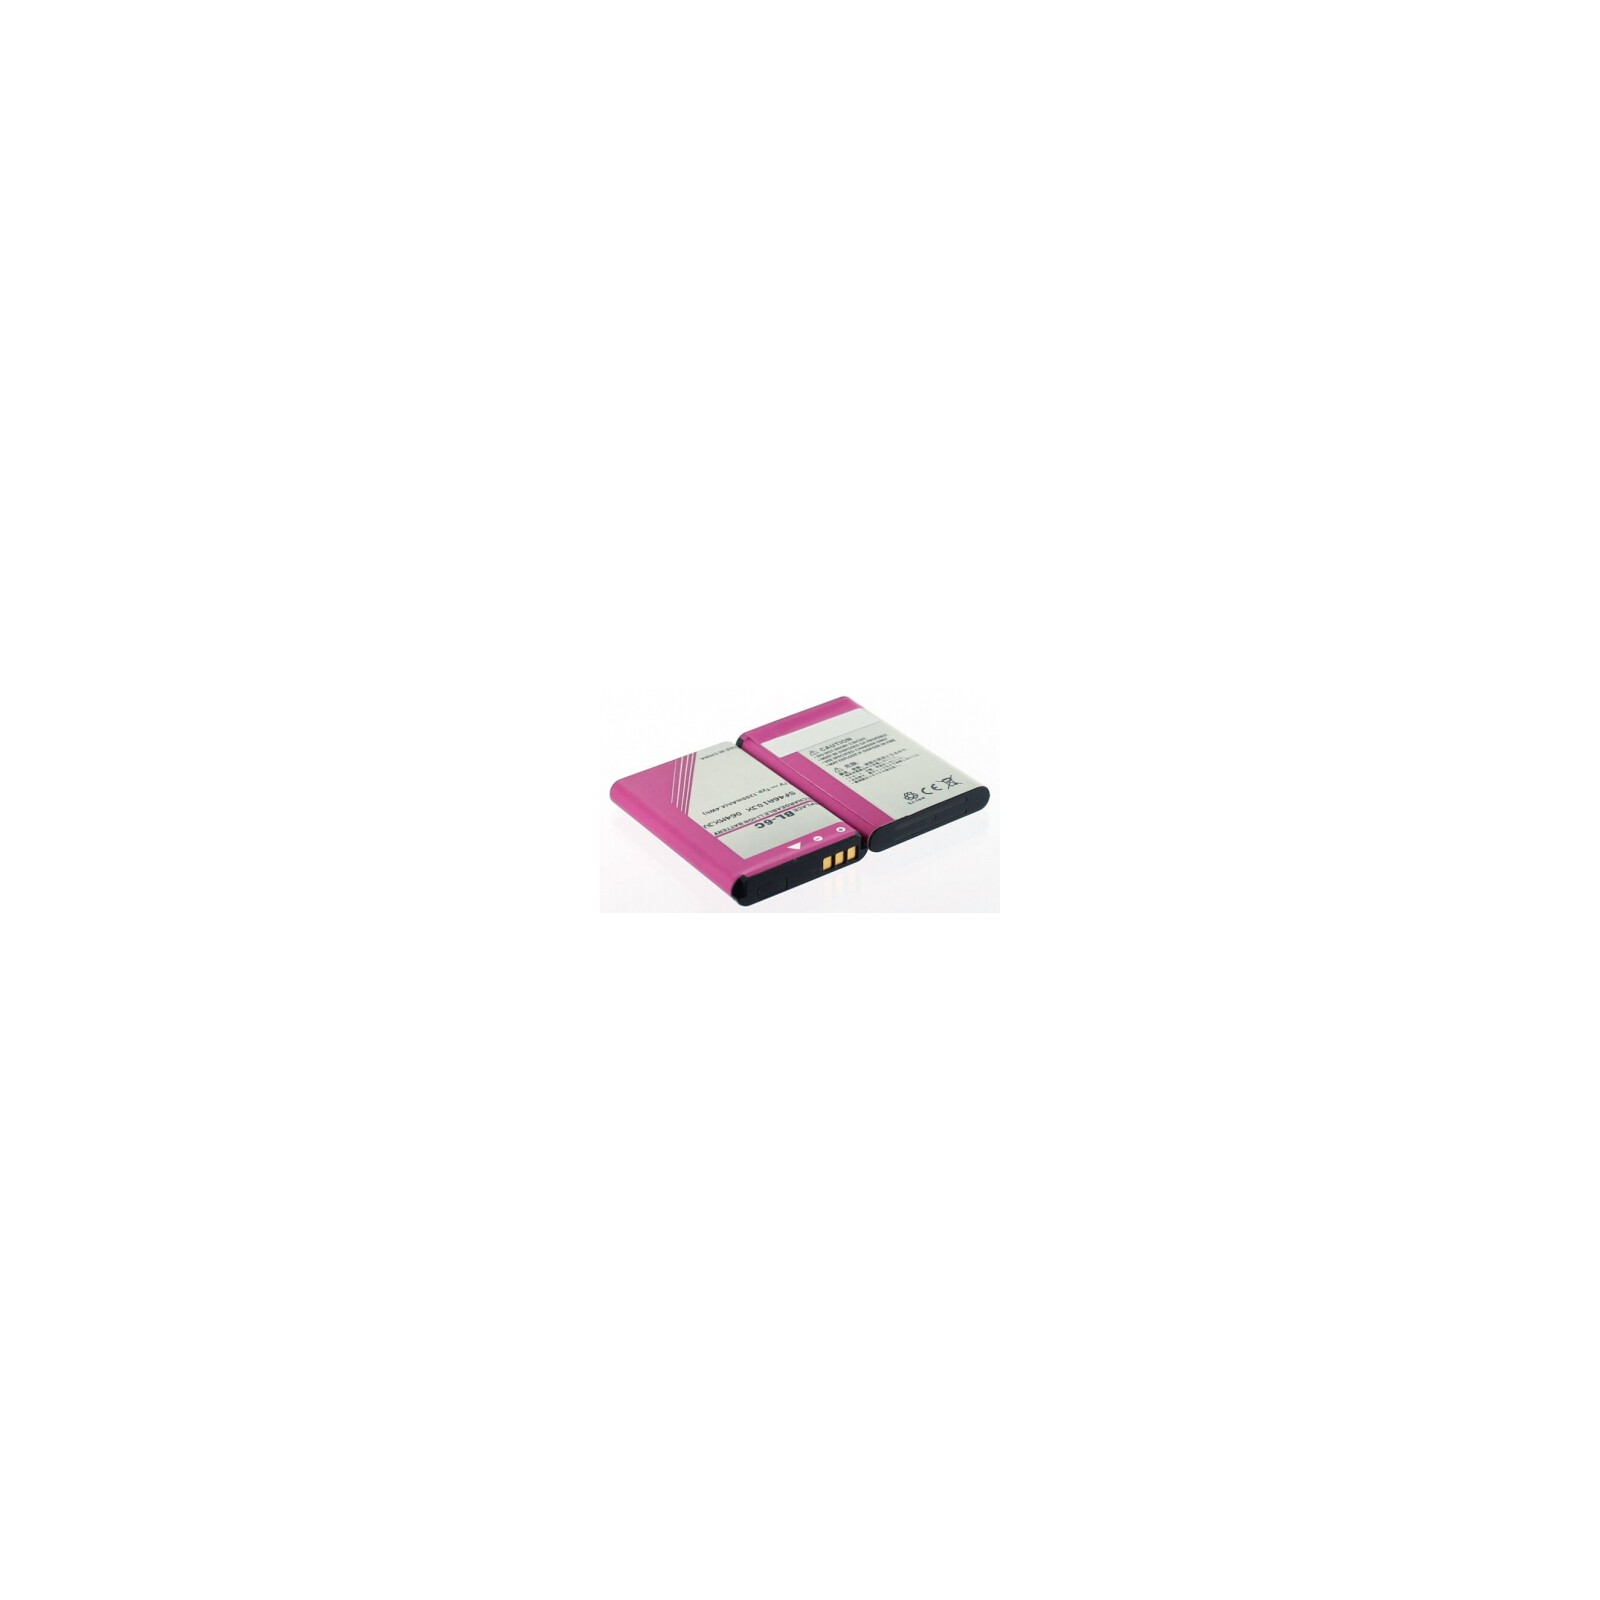 AGI Akku Nokia N-Gage QD 1.000mAh